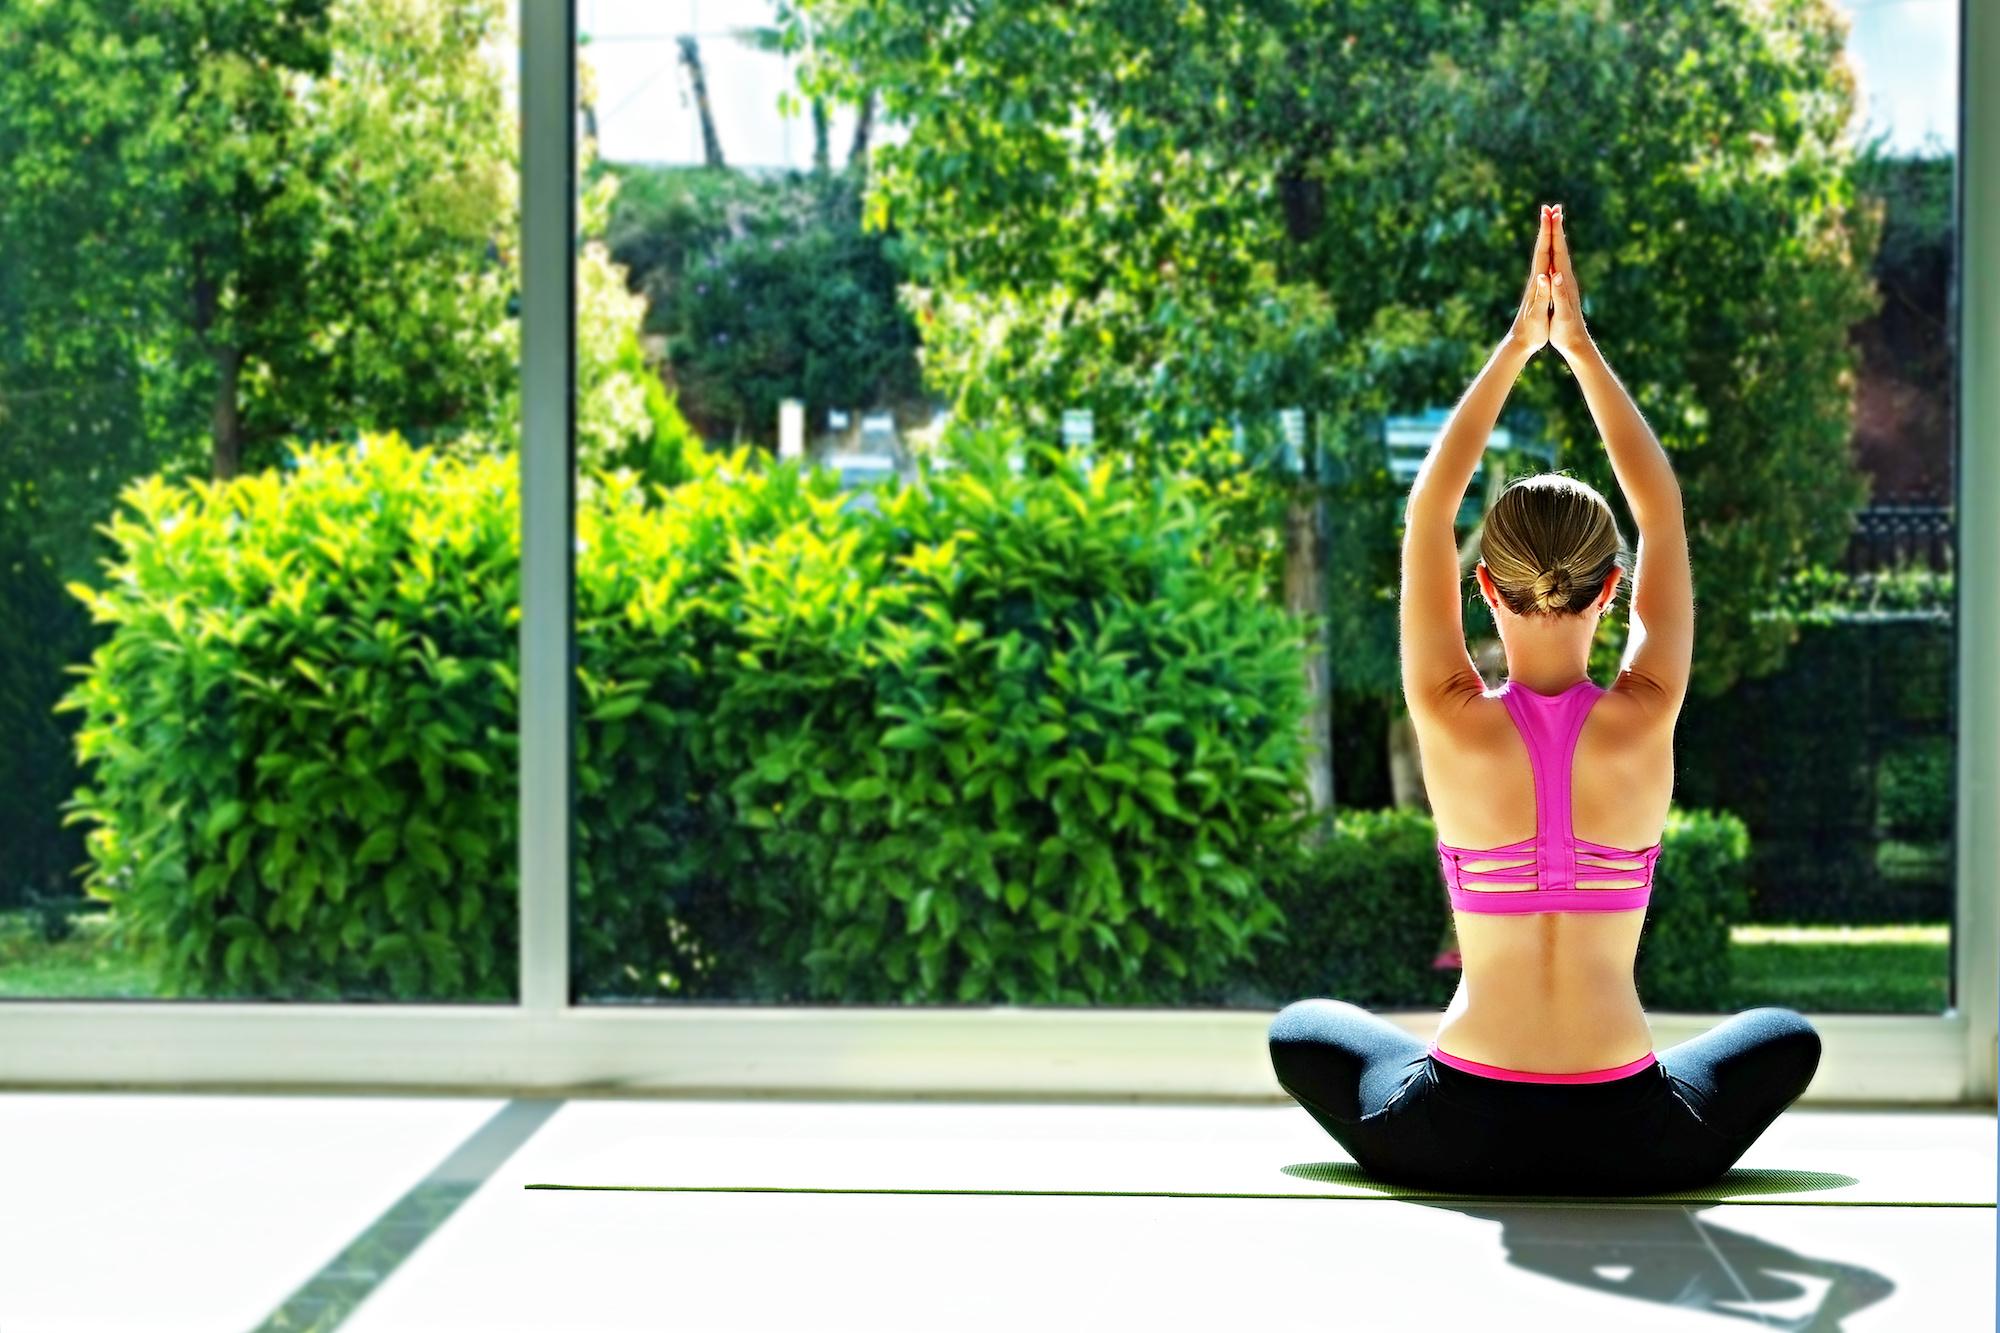 Garden room gyms and health studios